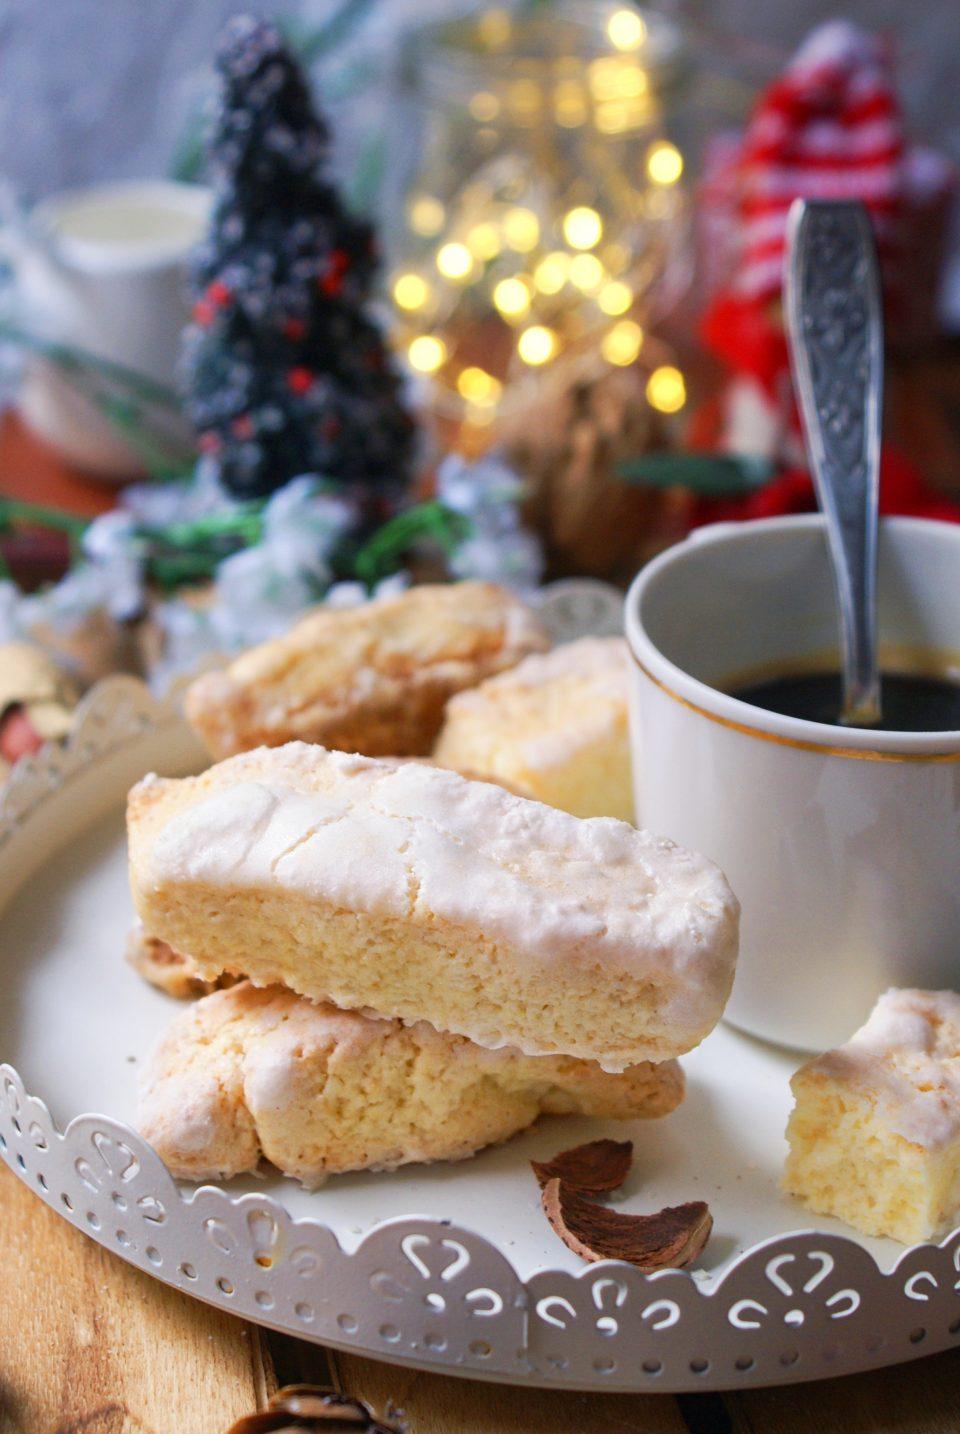 Biscotti all'anice senza glutine ricoperti di zucchero a velo